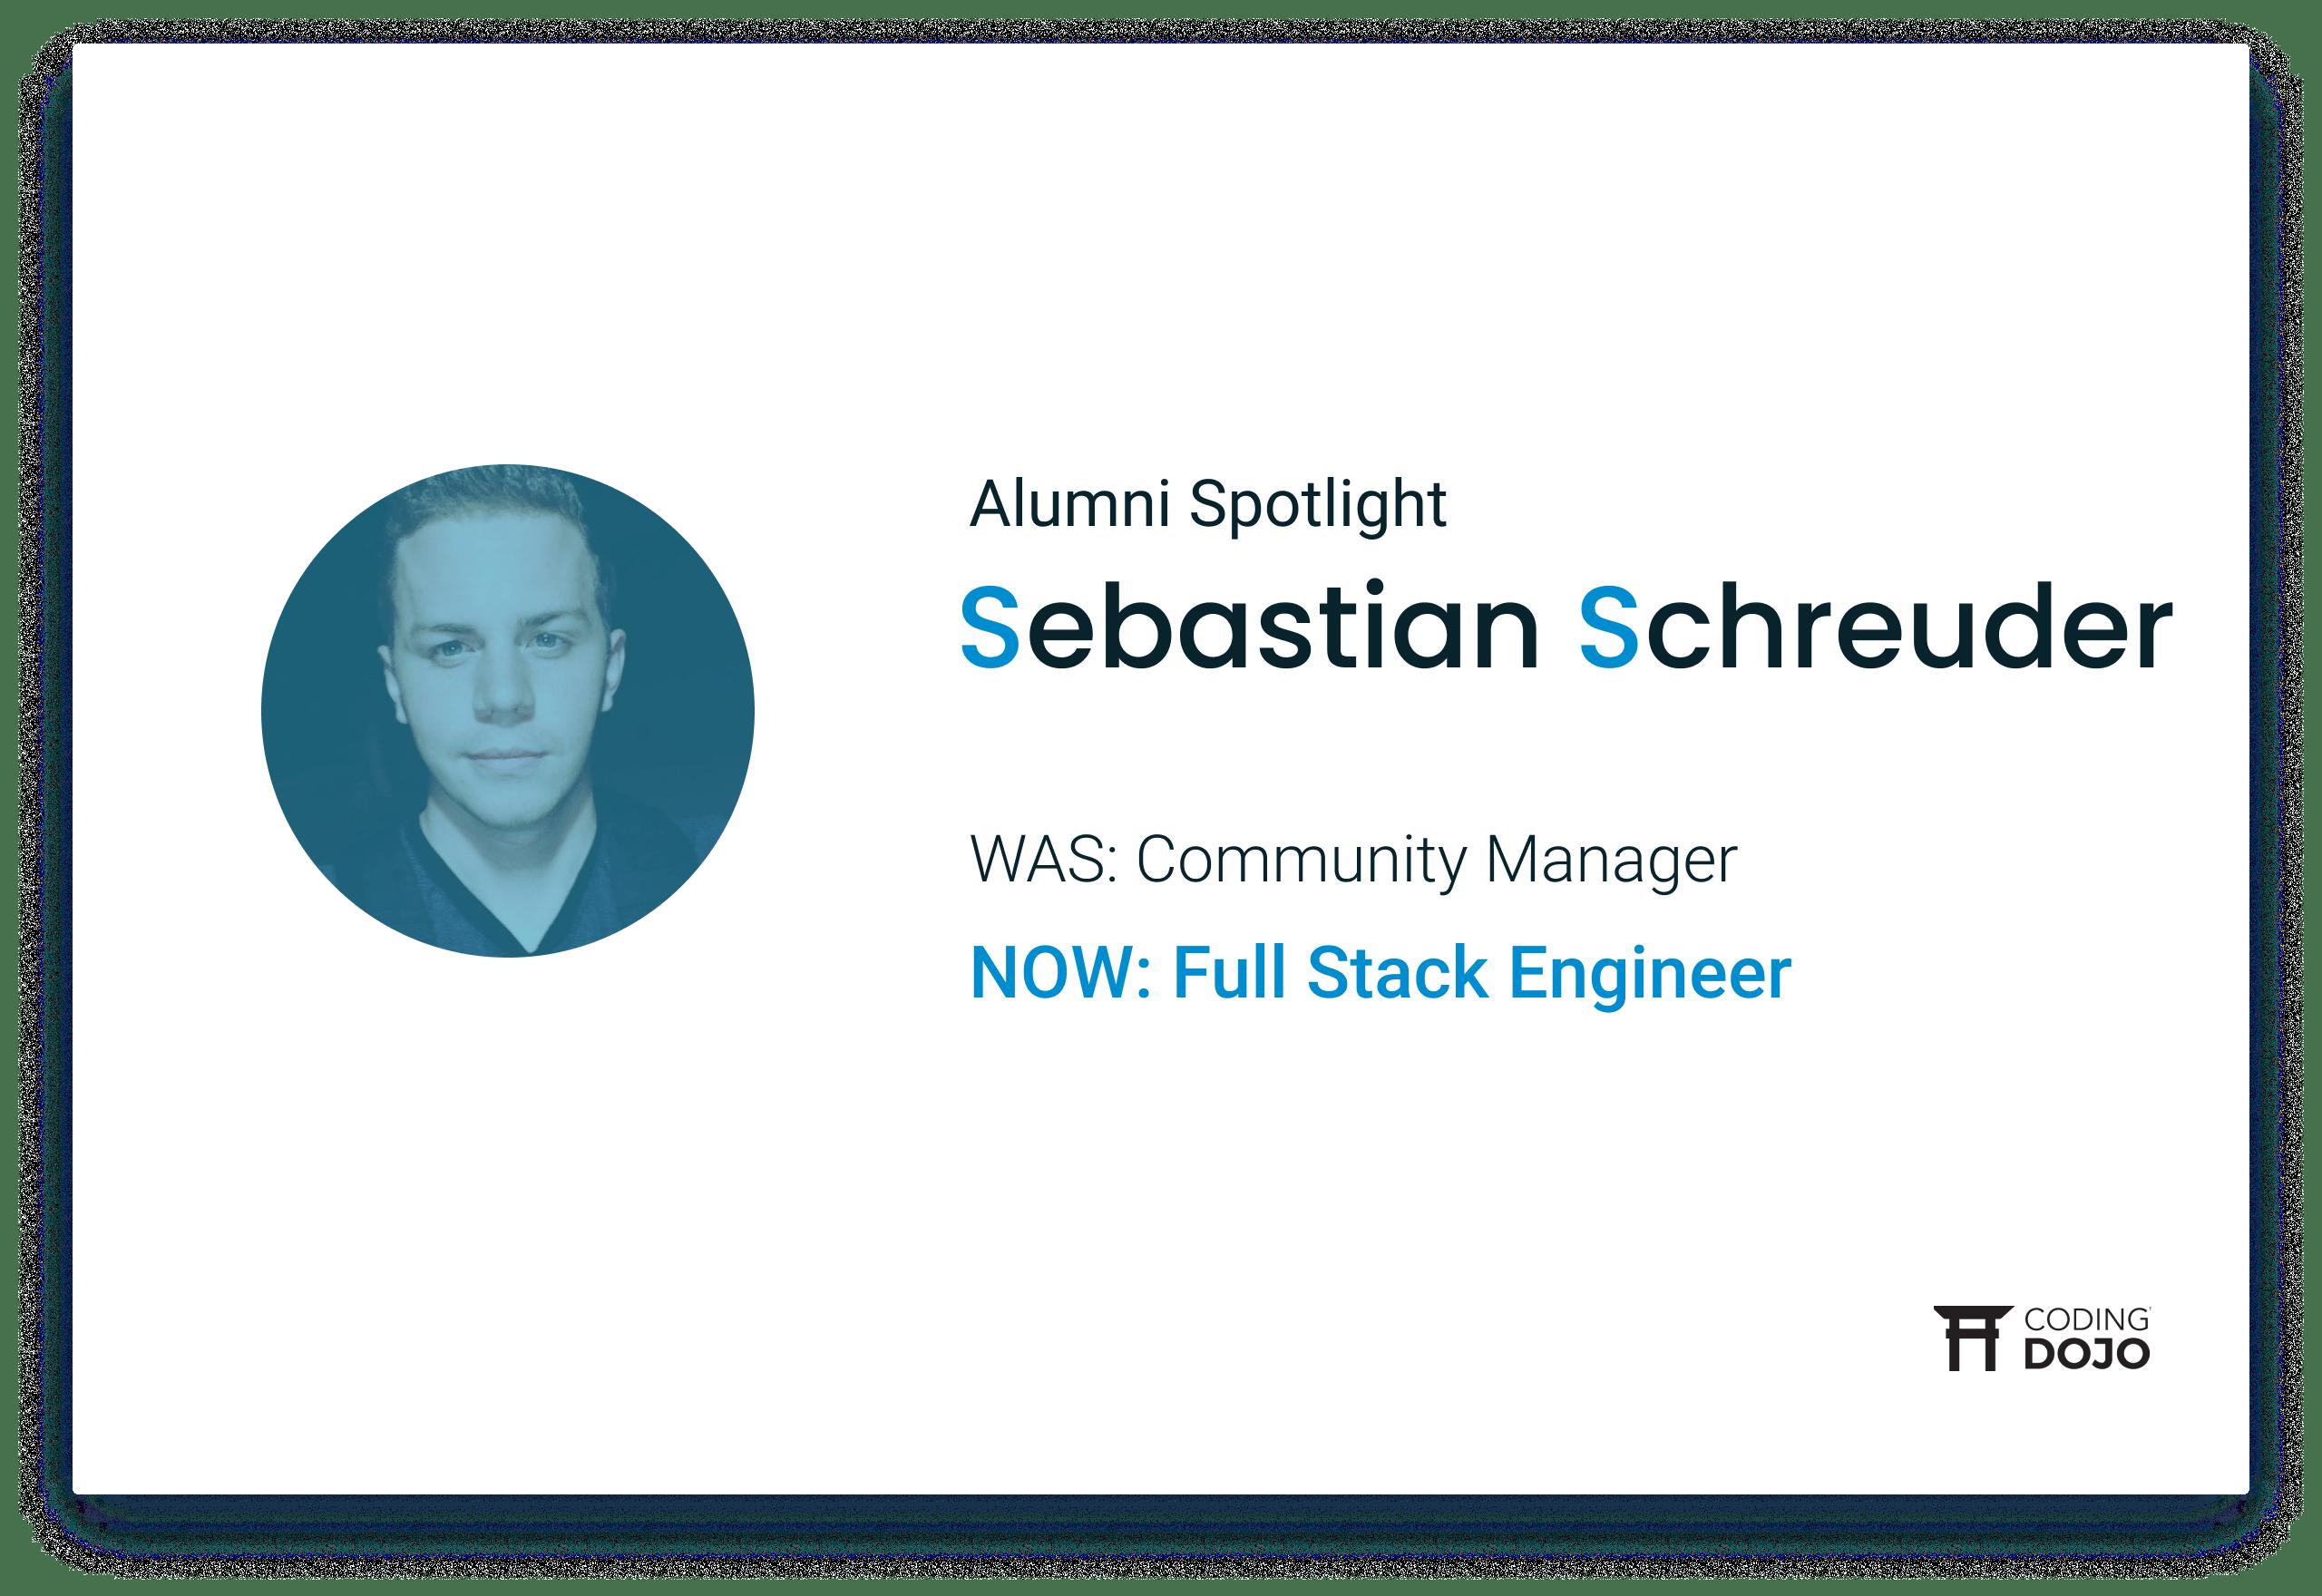 Coding Dojo Alumni Success | Sebastian Schreuder